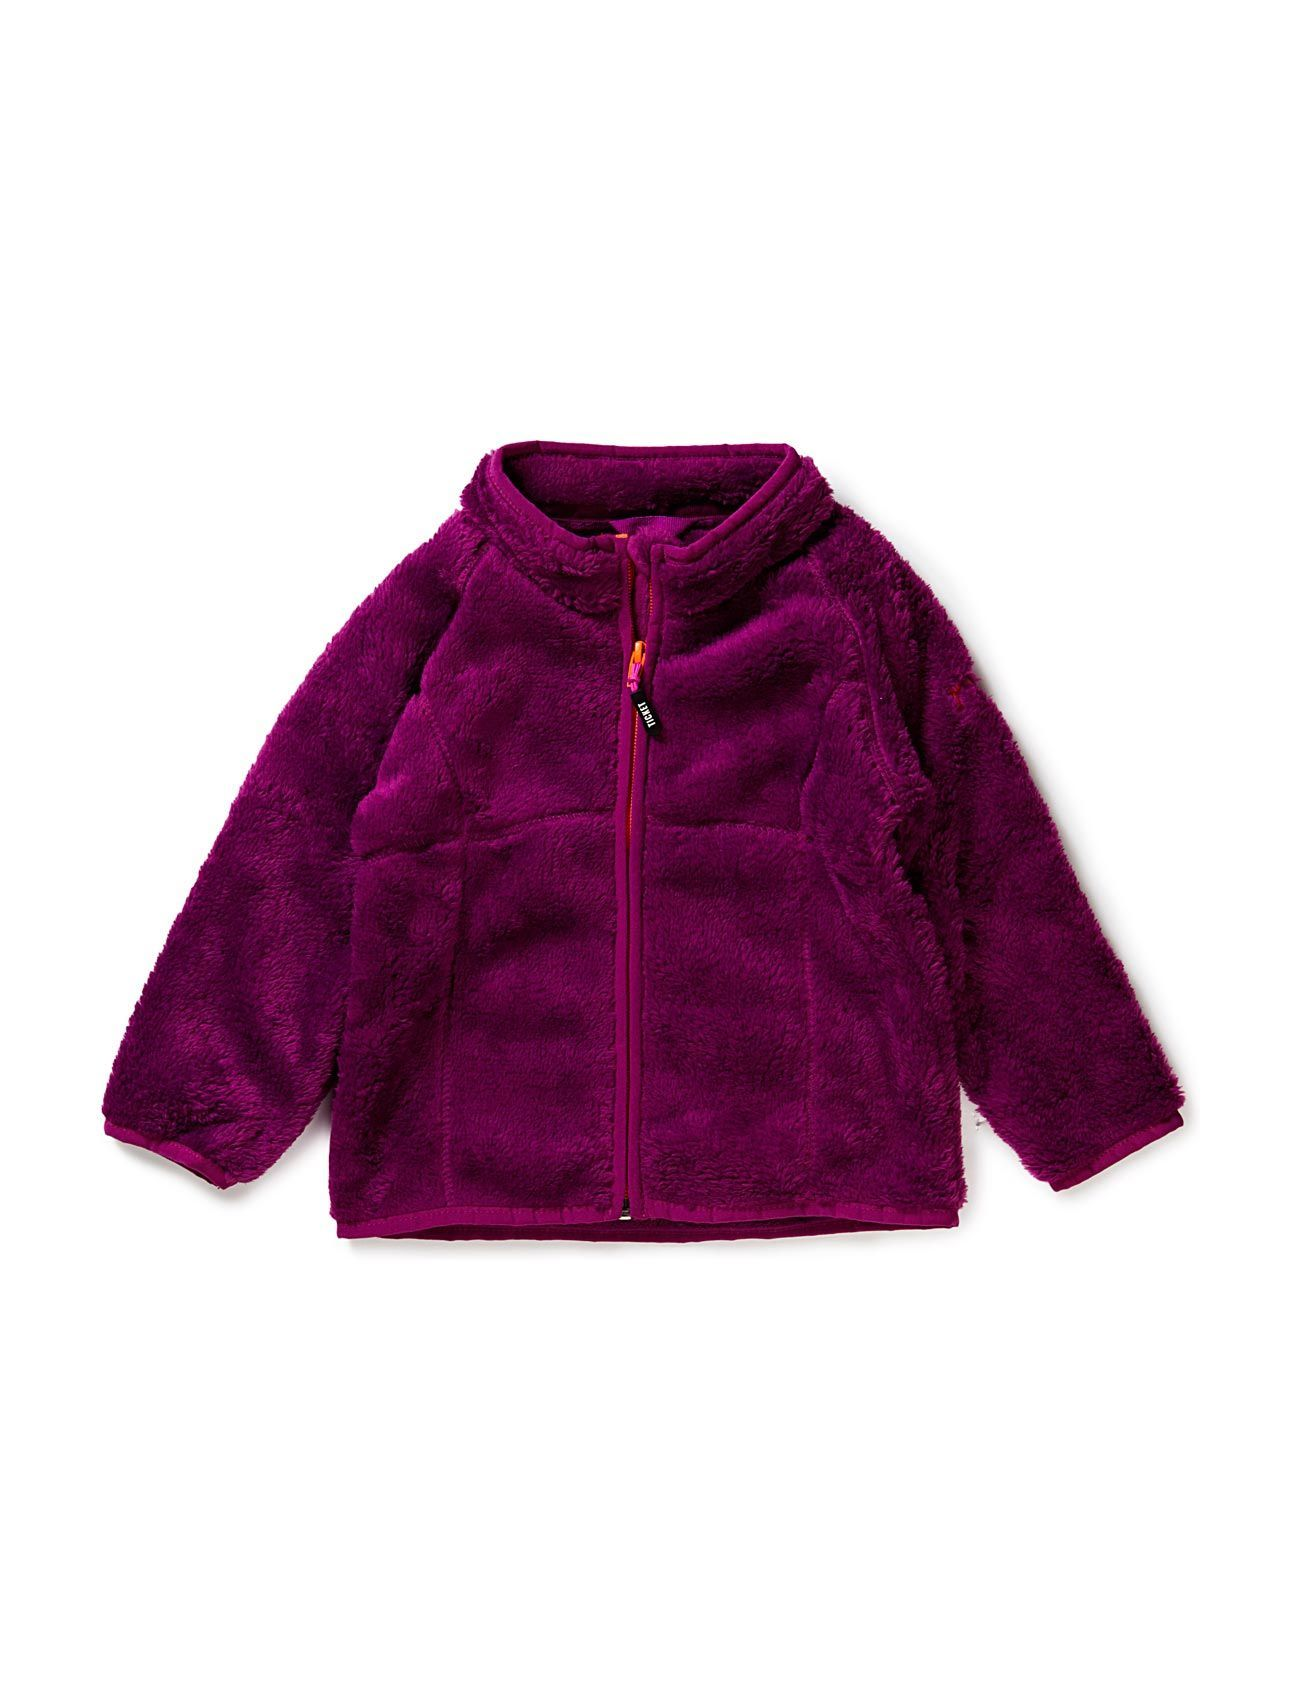 Magnolia Baby Jacket